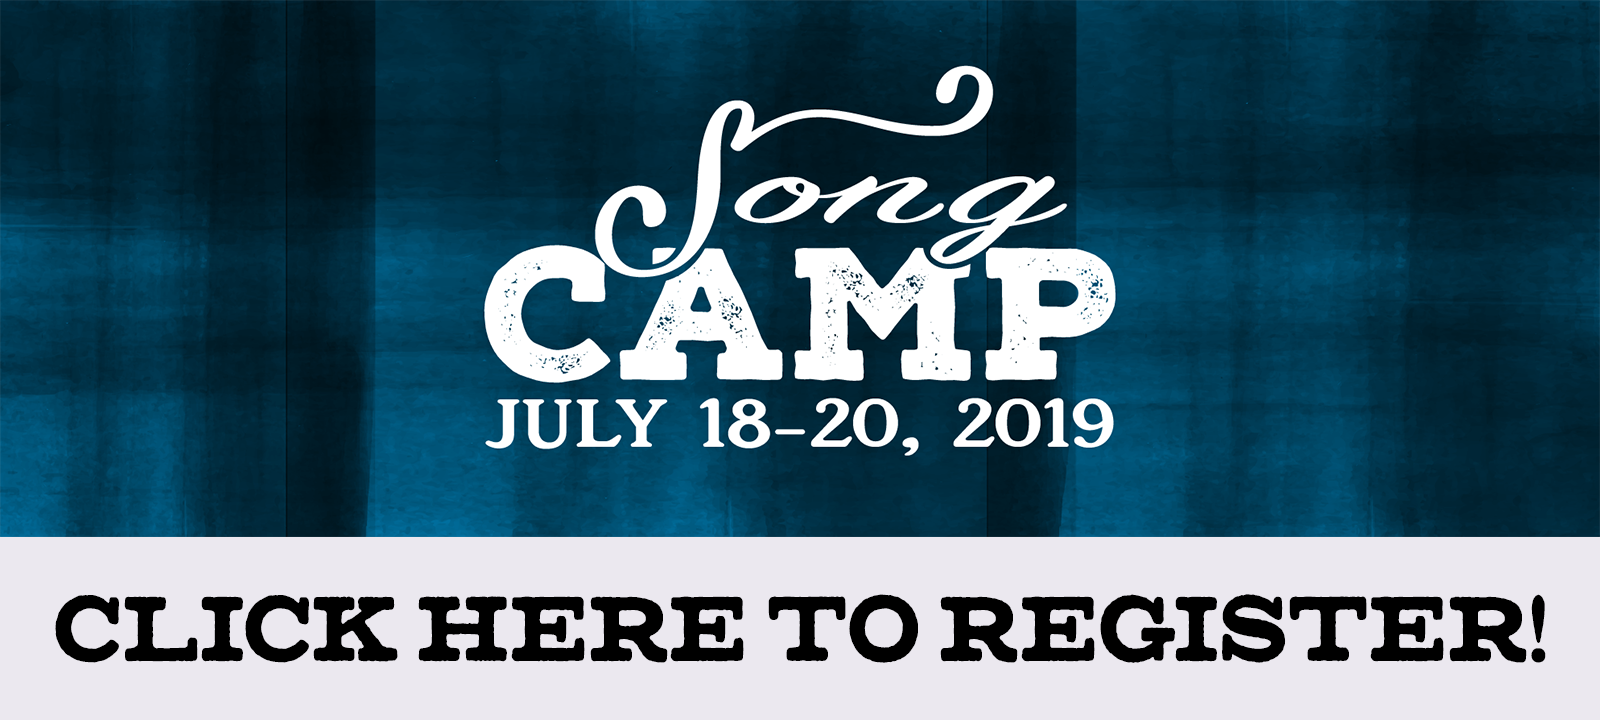 Song Camp 2019 | Nashville Songwriters Association International